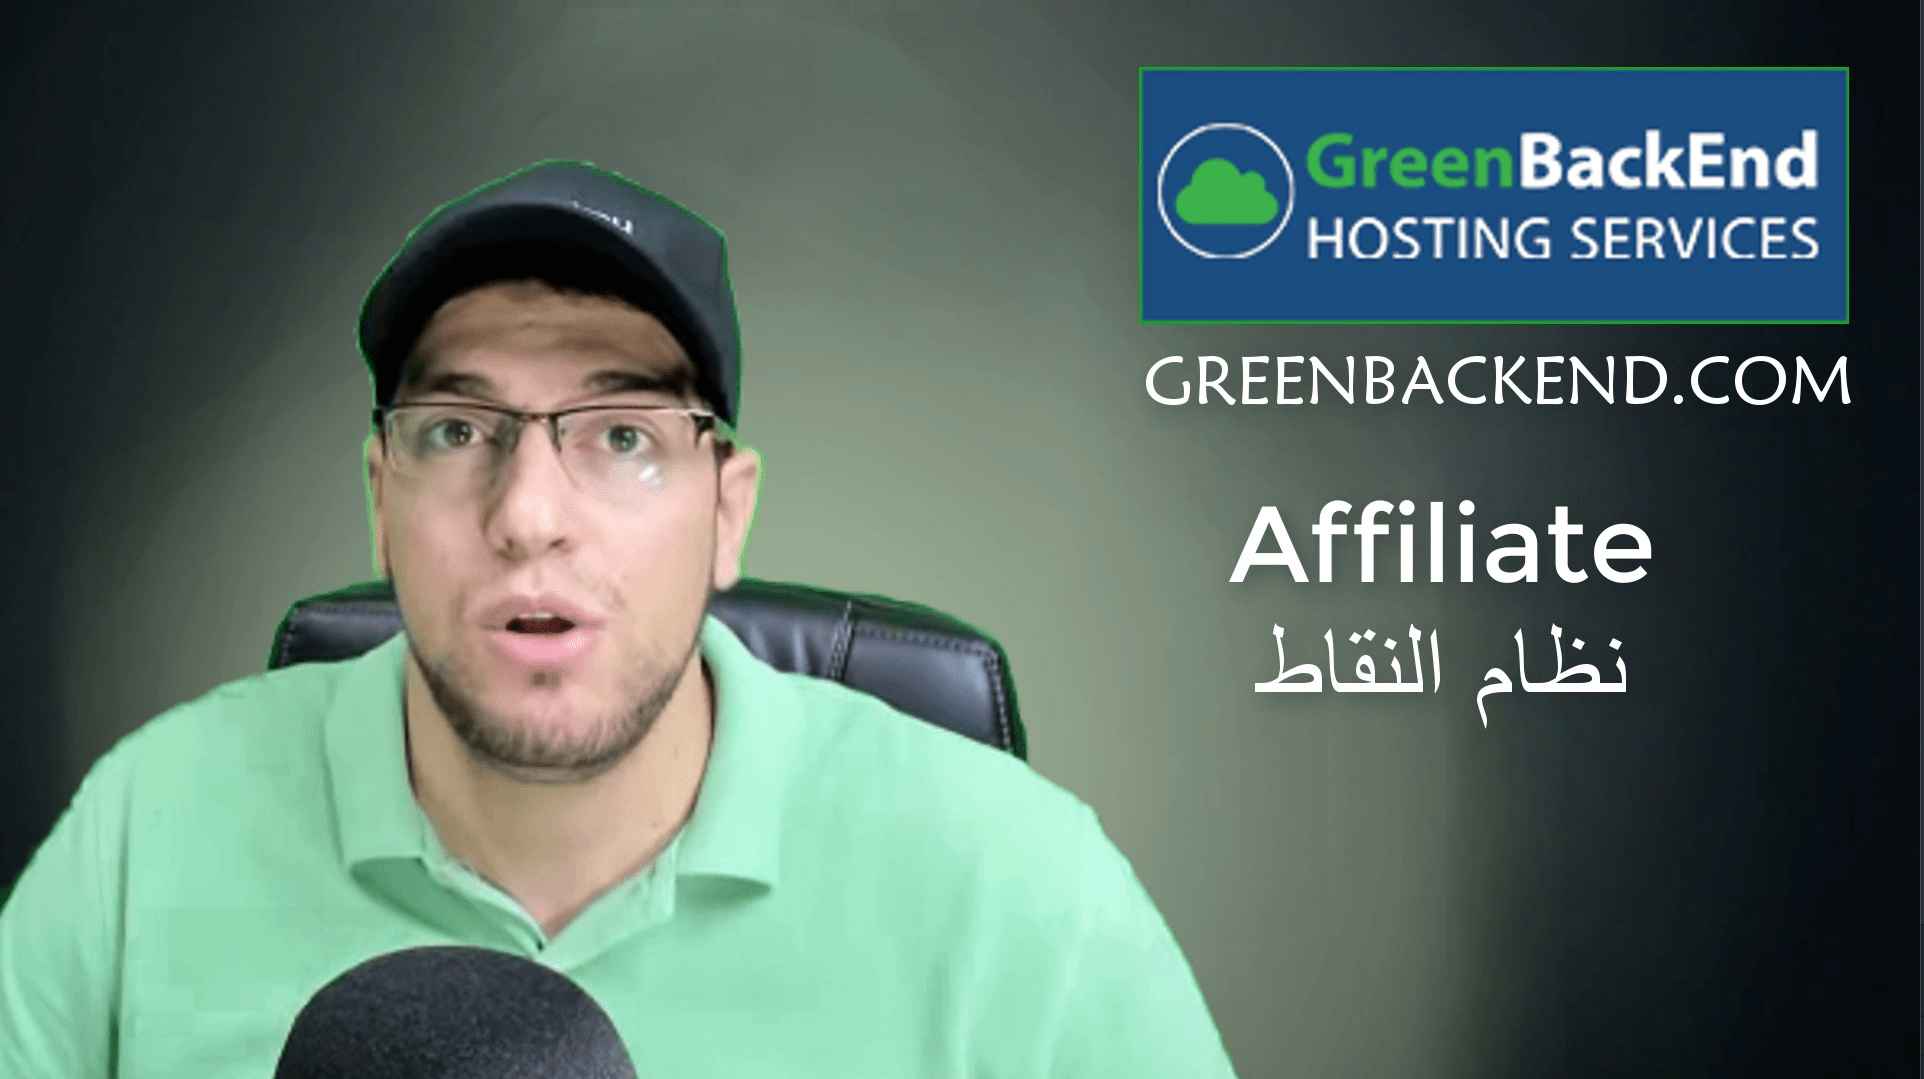 Photo of الربح والتسويق بالعمولة مع شركة جرين باك اند للاستضافة باللغة العربية